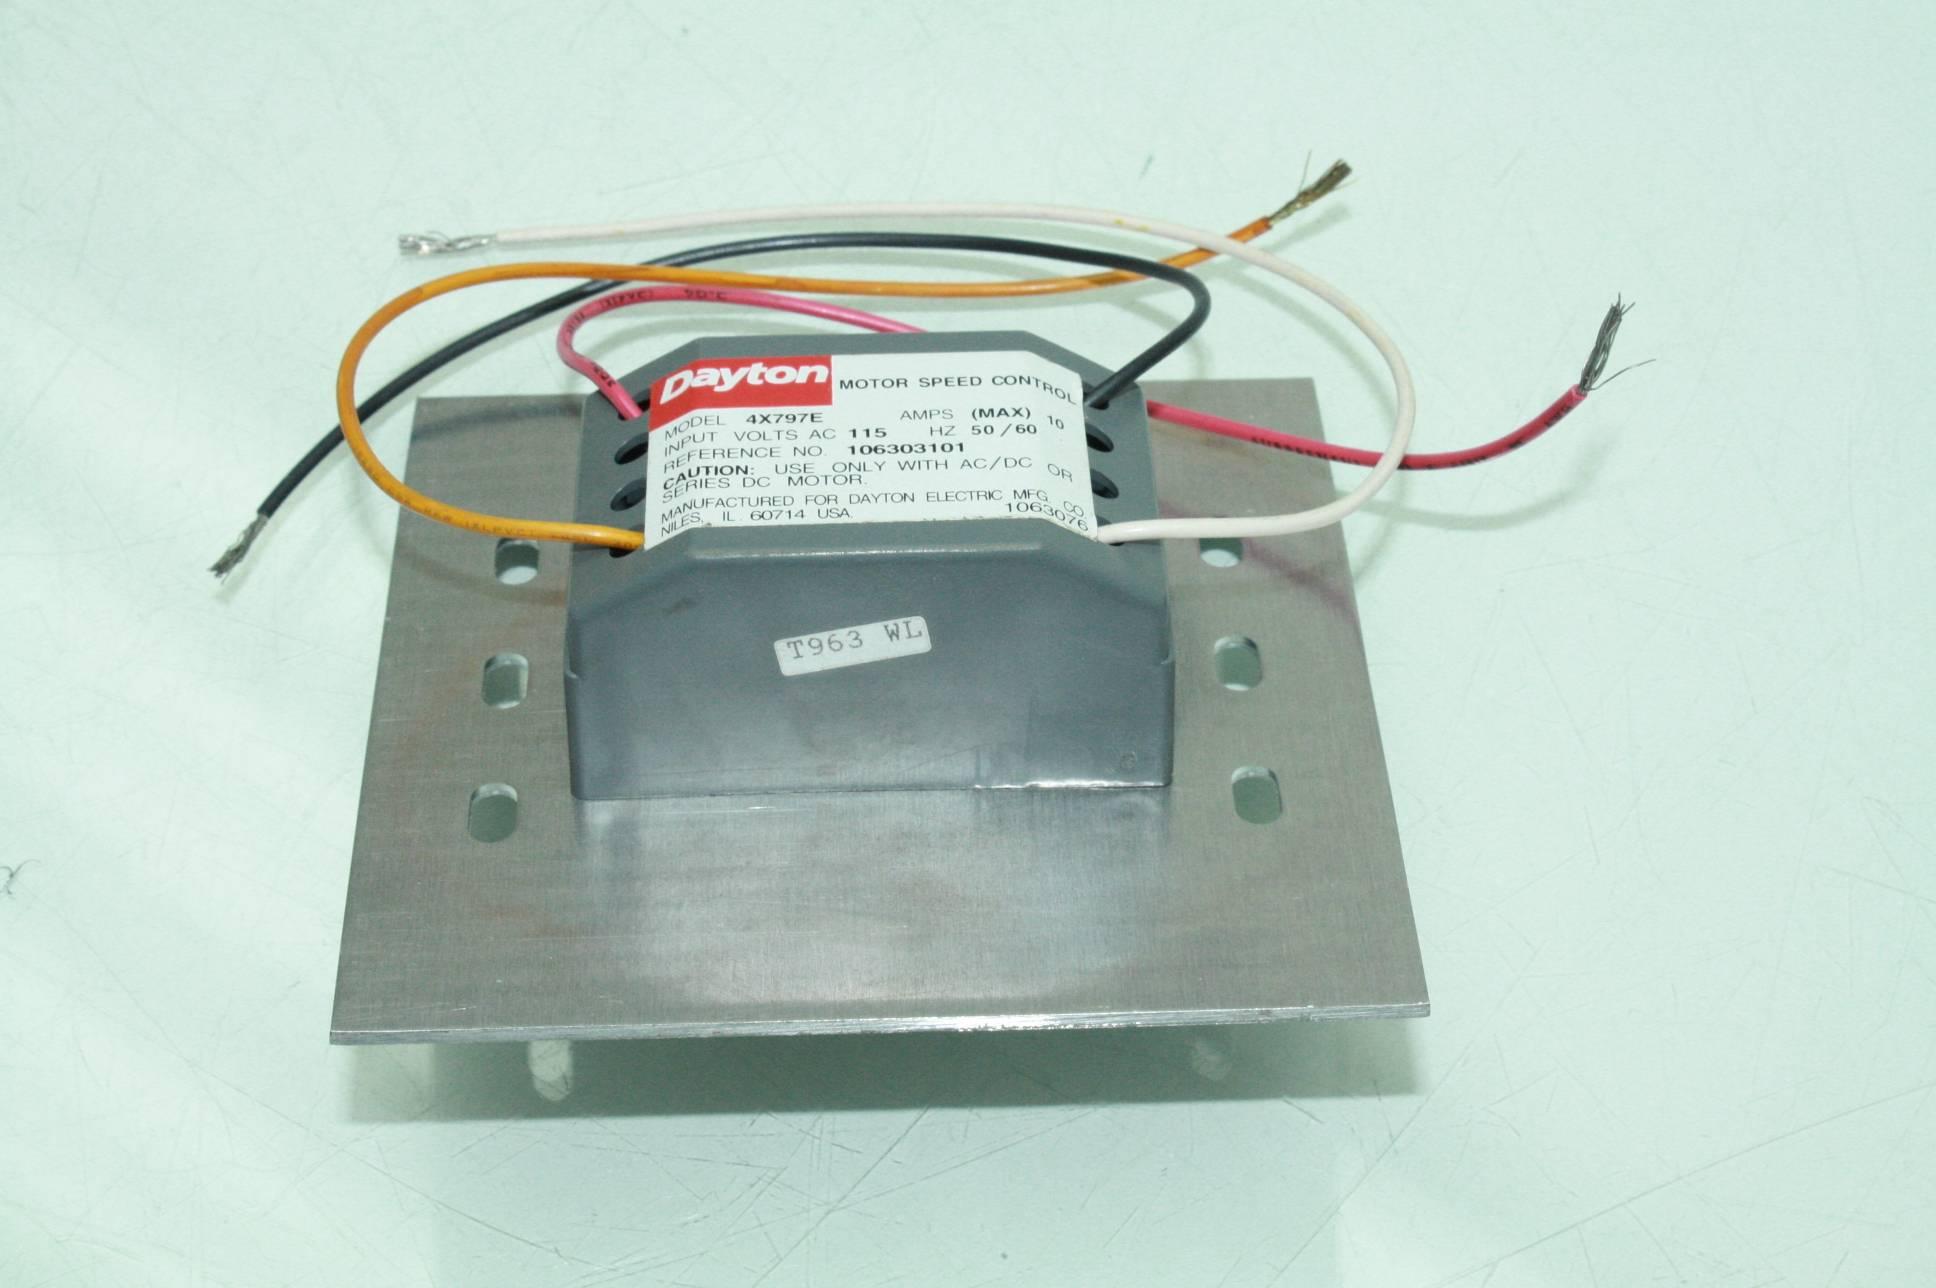 Dayton Fan Motor Speed Control 4x797e 10 Amps 115v Ac Ebay